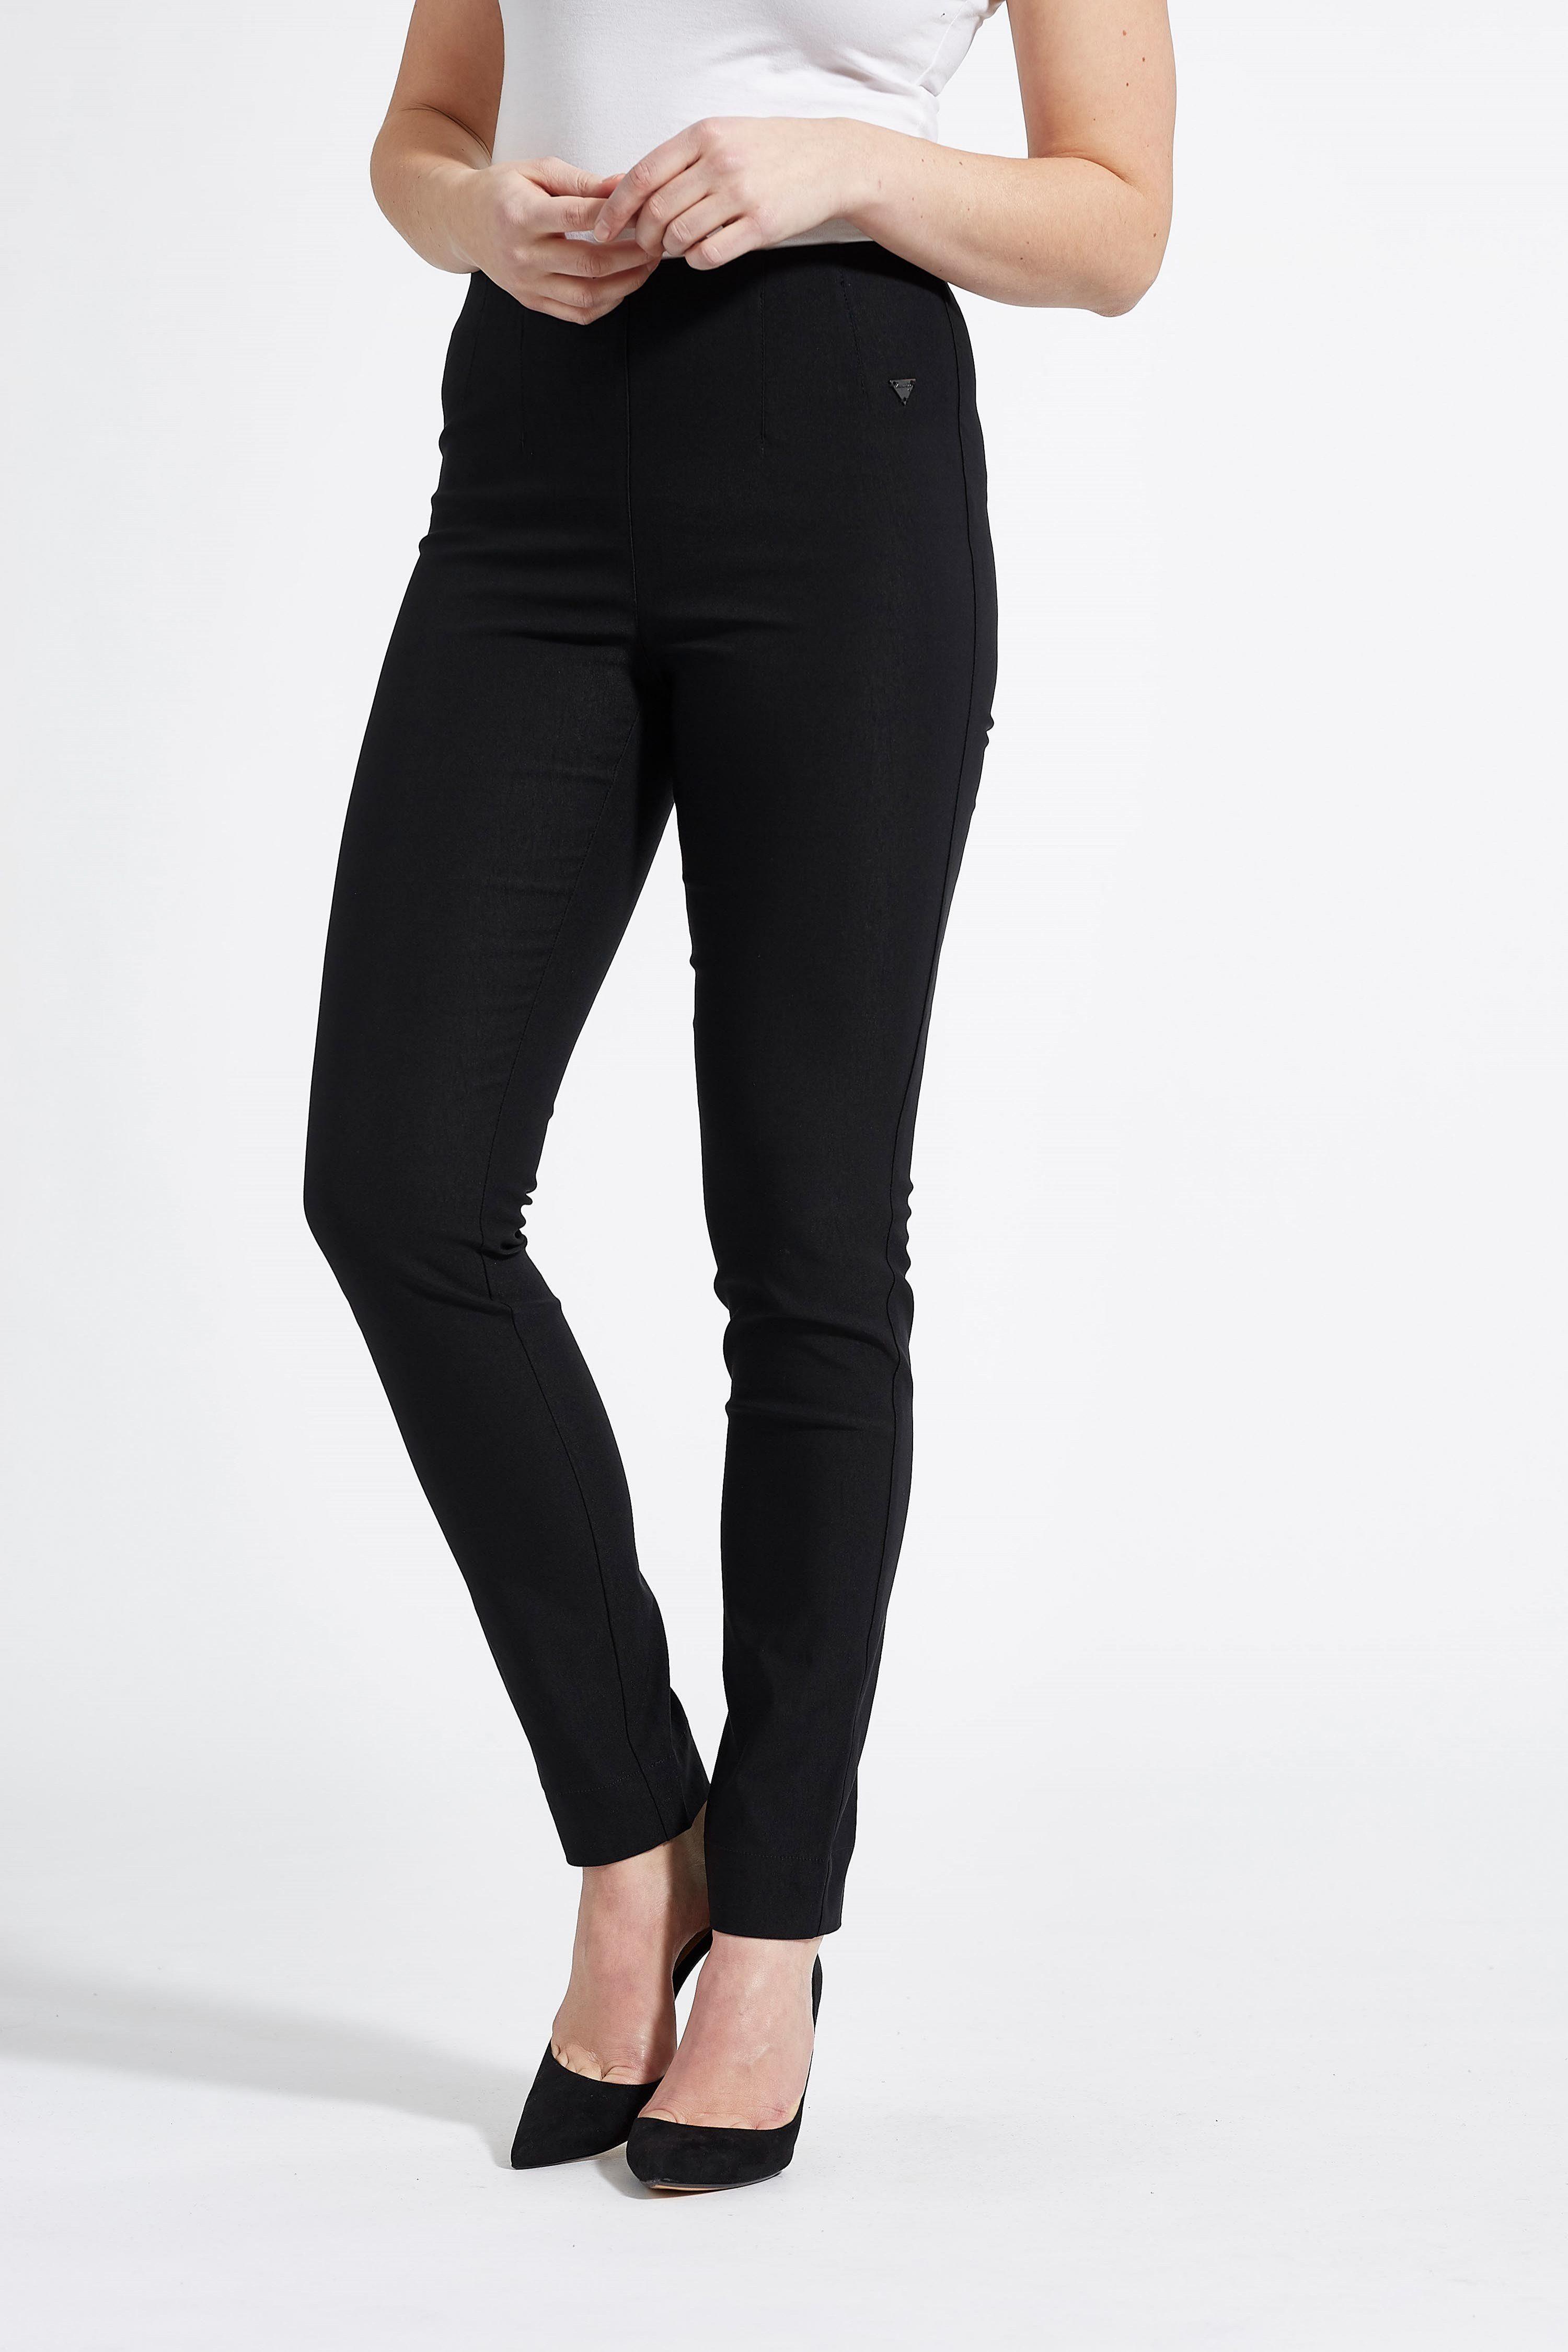 LauRie Stoffhose »Modell Vicky mit elastischem Bund«